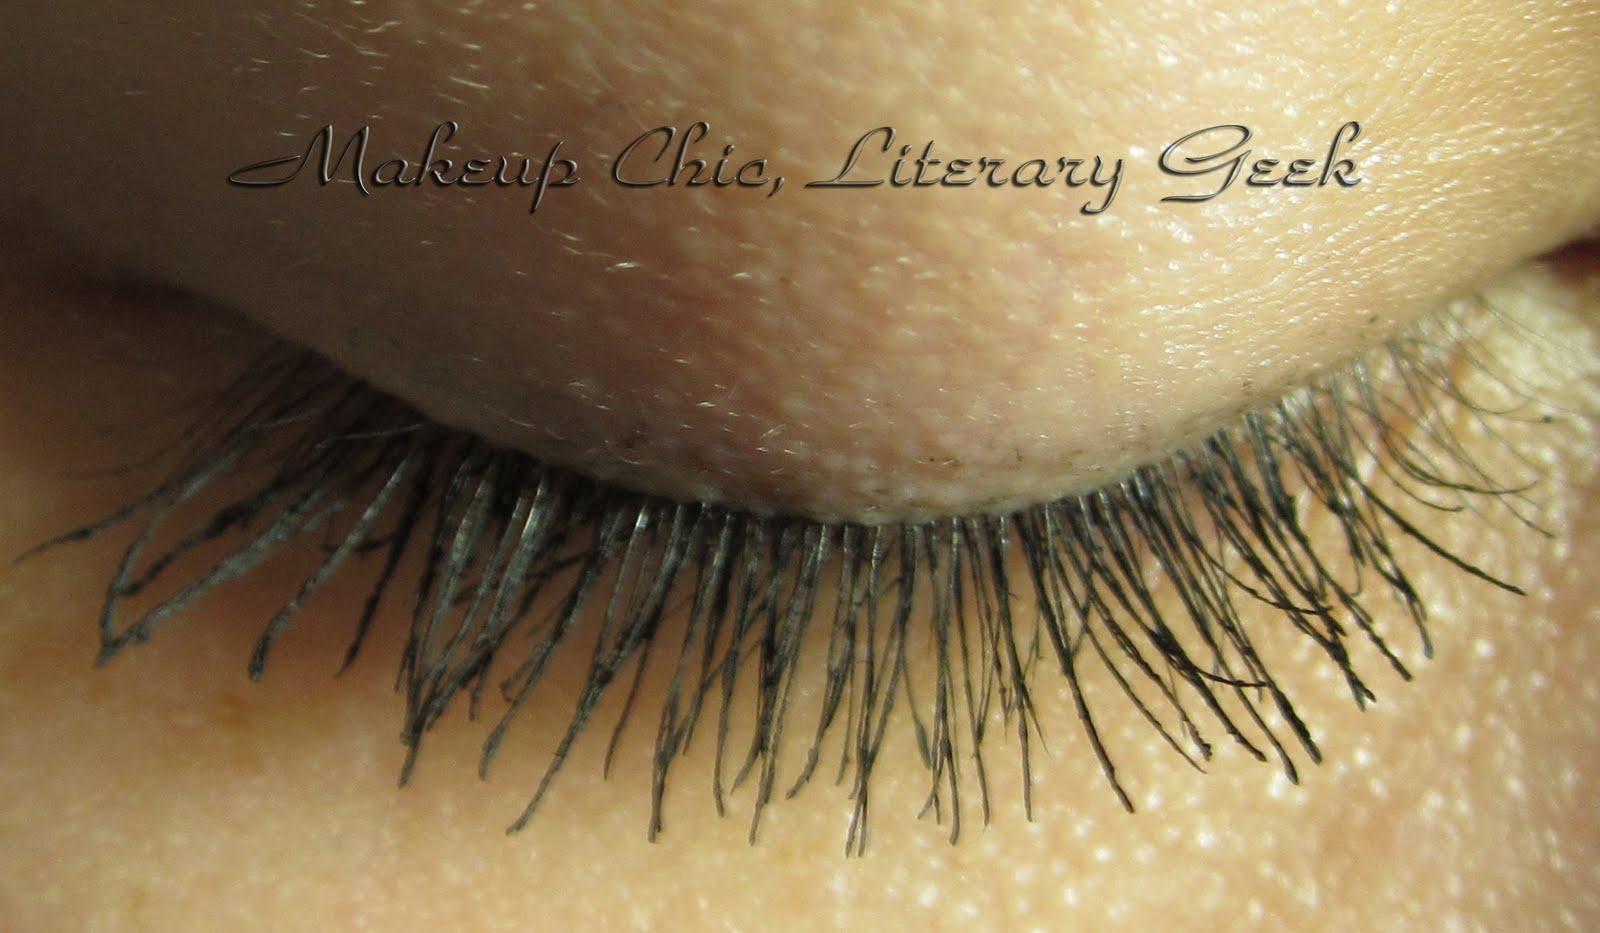 Full 'N Soft Washable Mascara by Maybelline #5